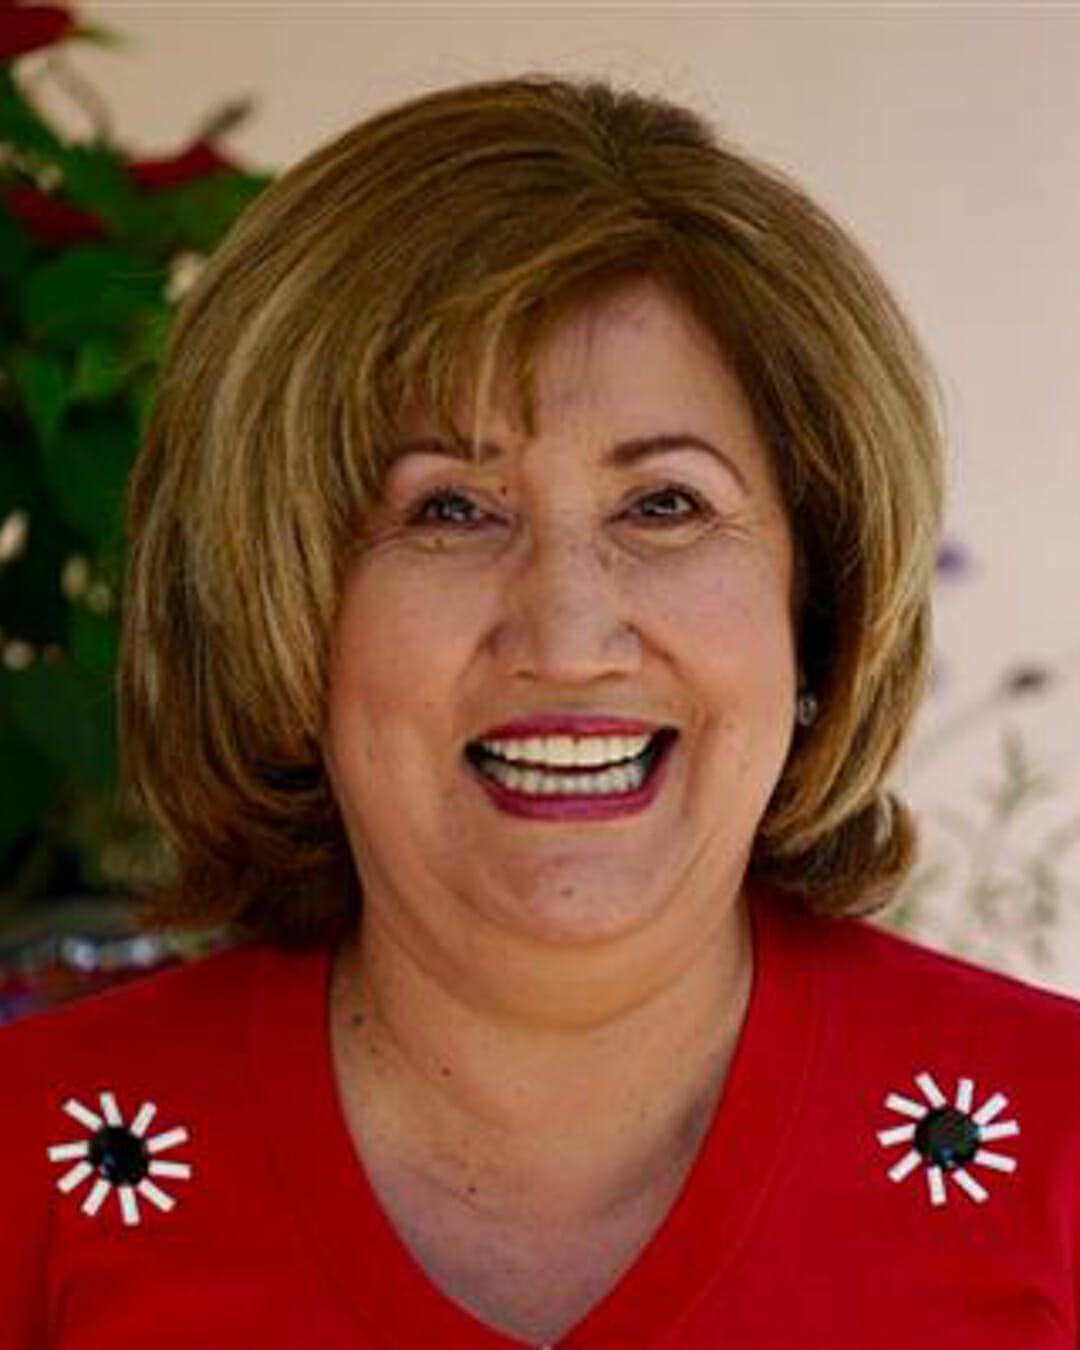 María Díaz-Slocum, RCSD School Board Vice President